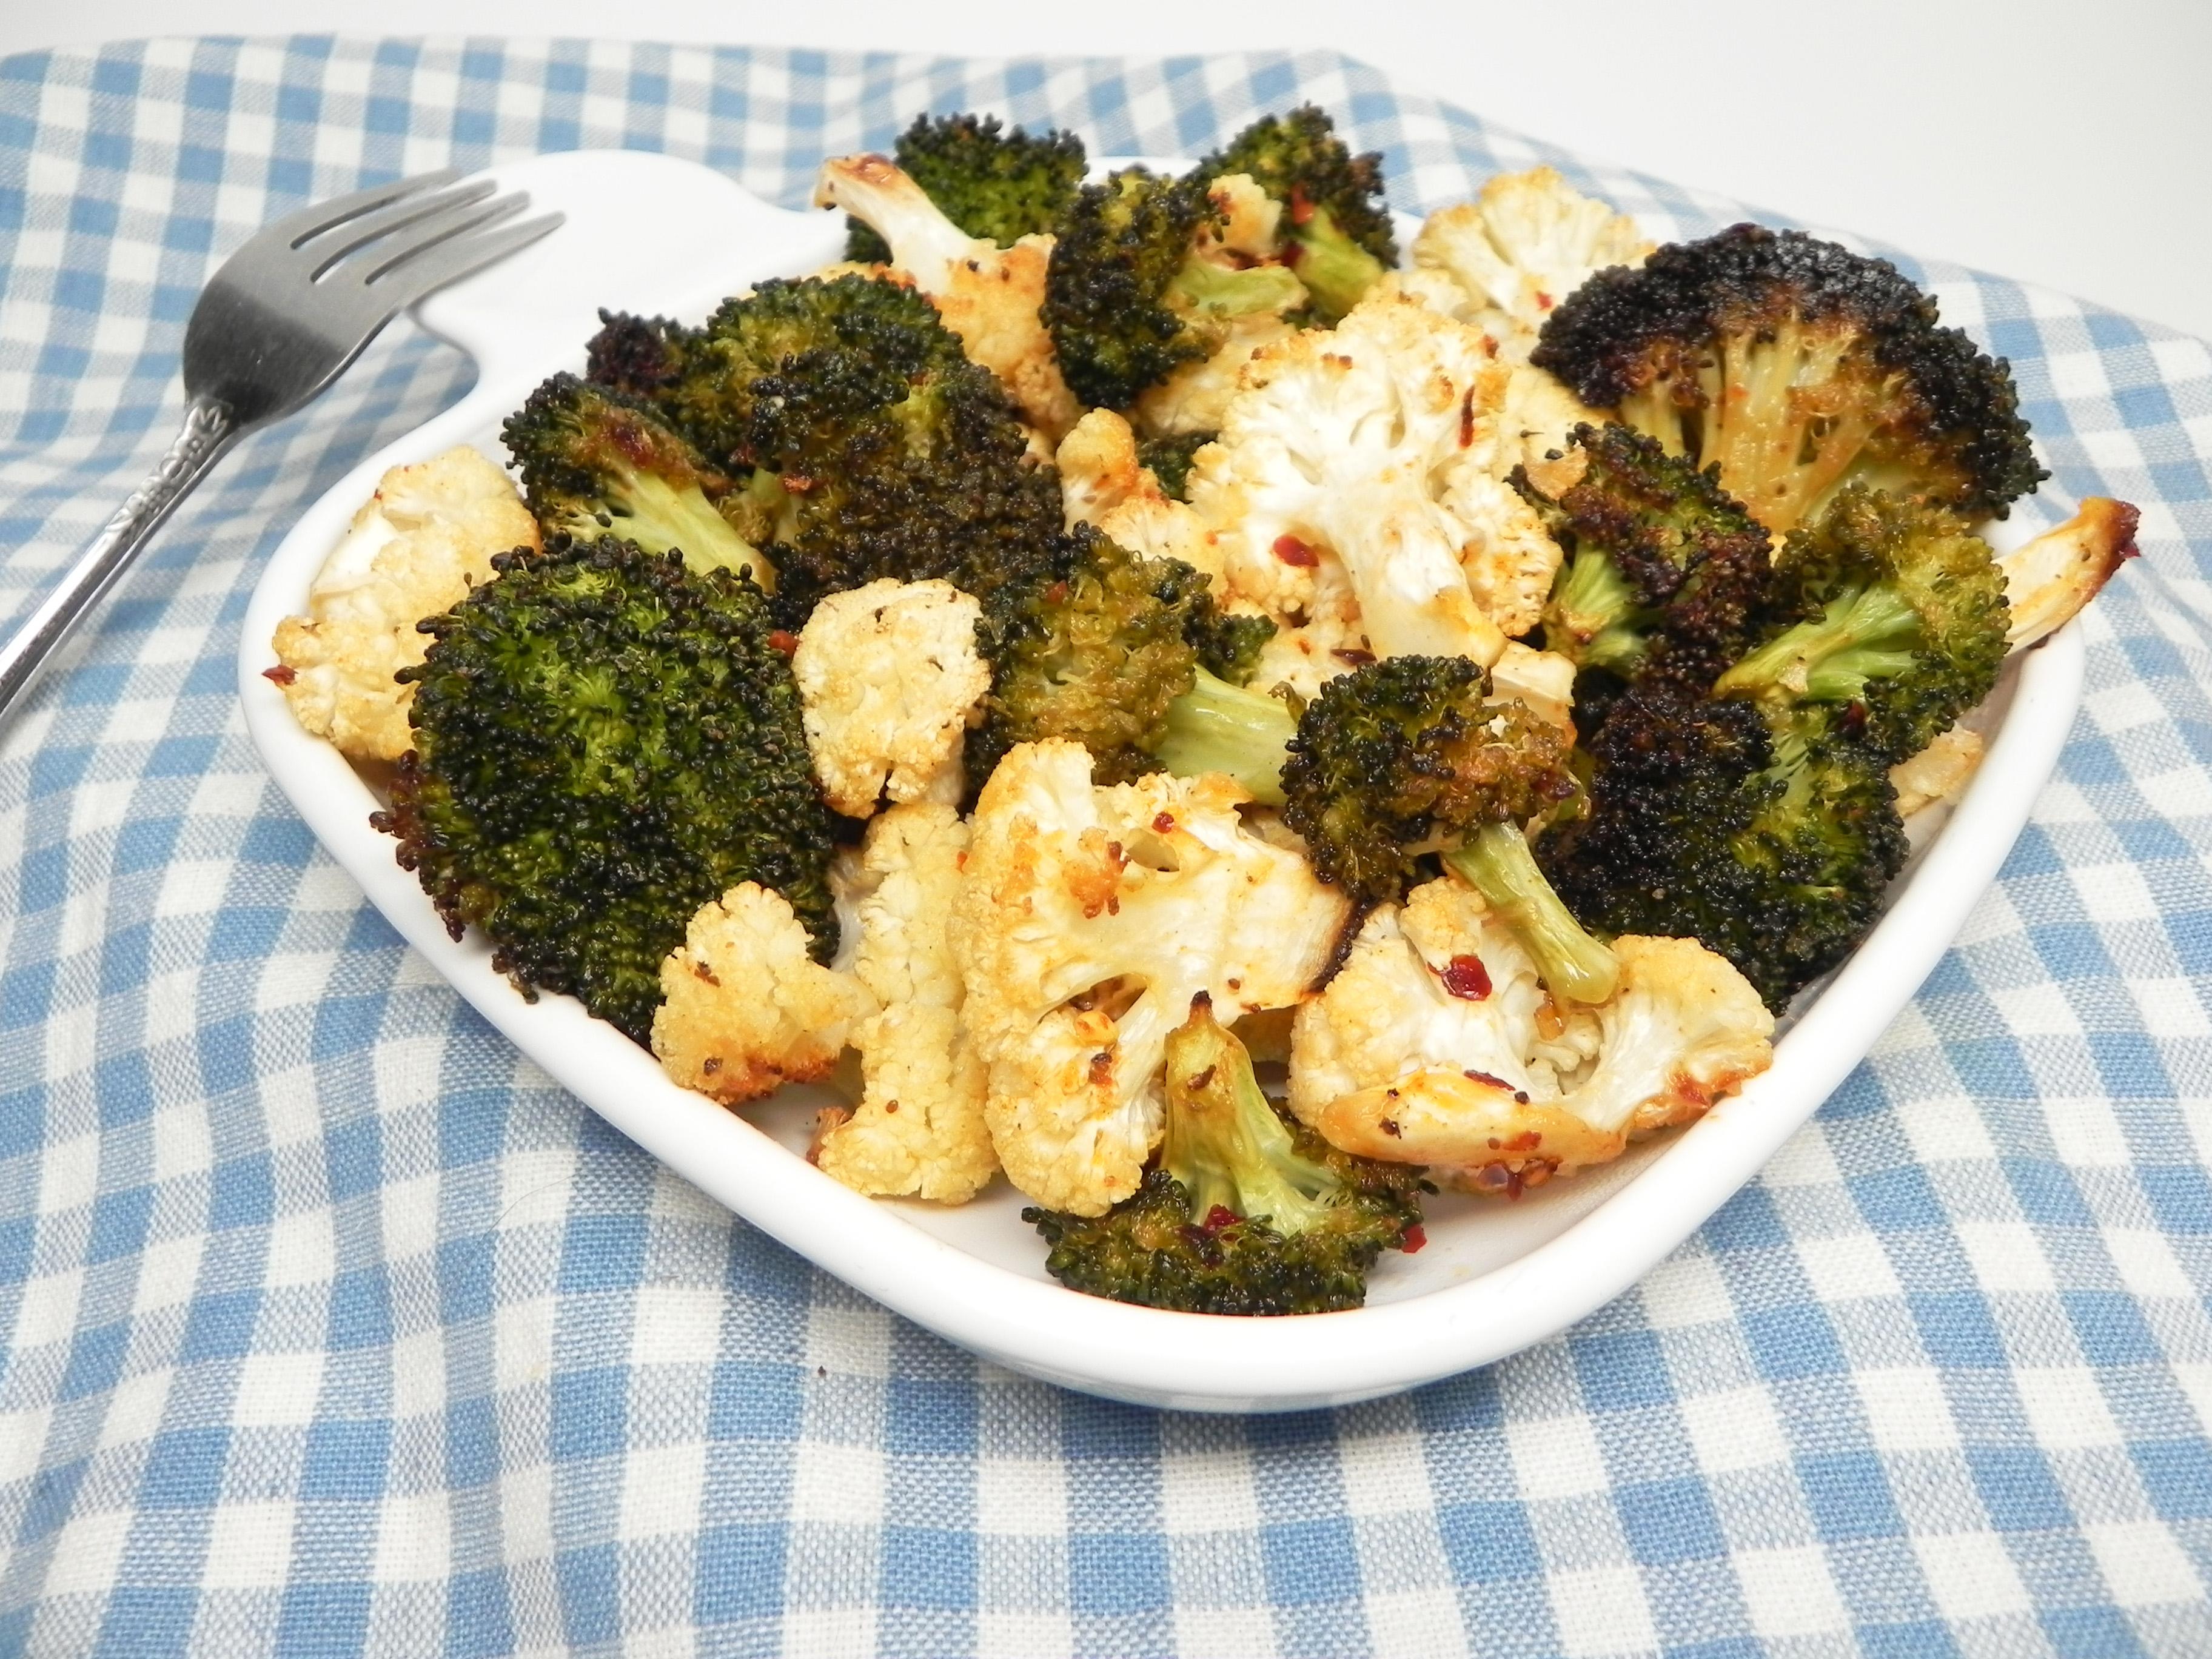 Lemon-Pepper Roasted Broccoli and Cauliflower